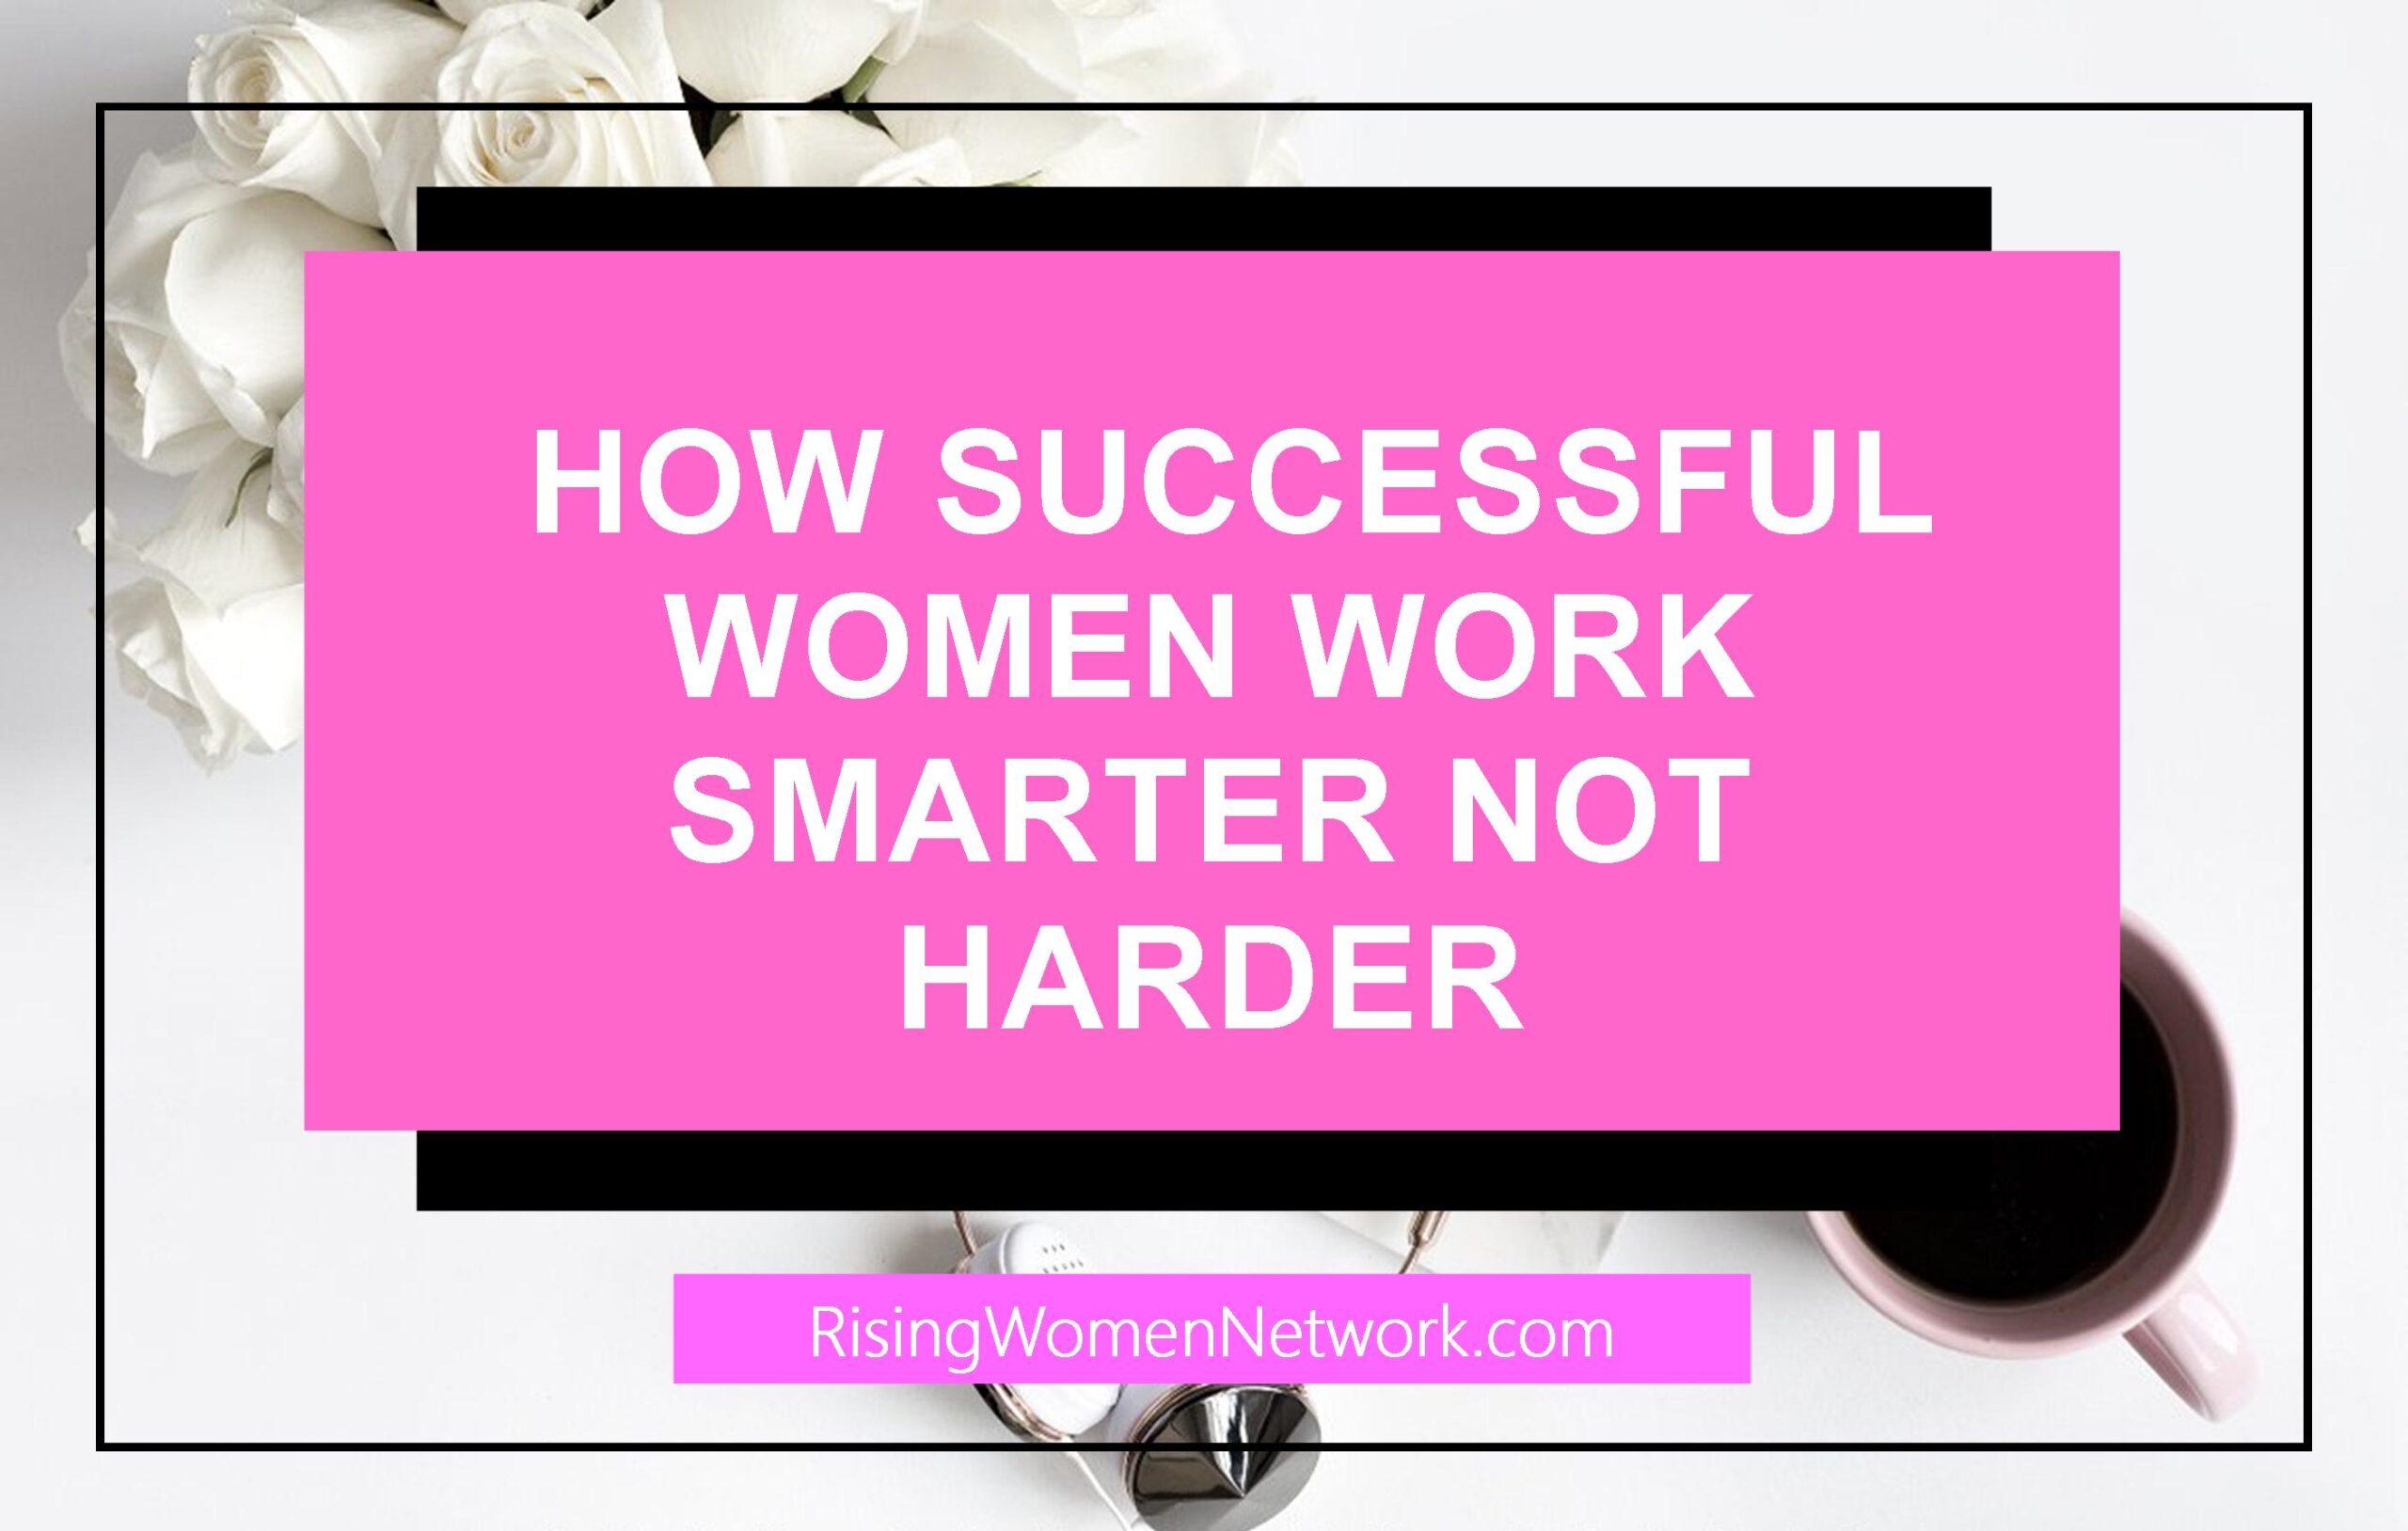 How Successful Women Work Smarter Not Harder